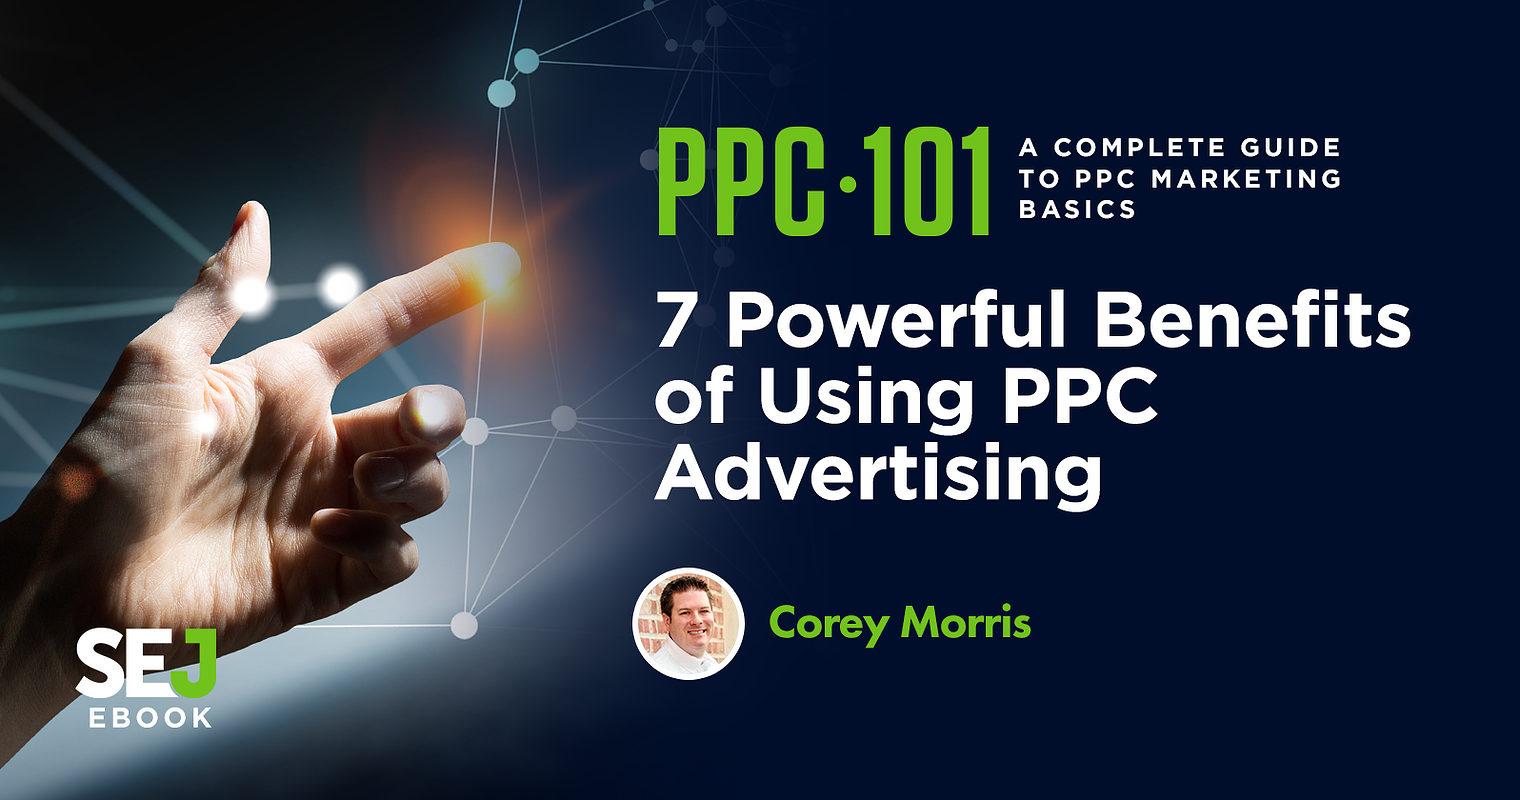 7 Powerful Benefits of Using PPC Advertising